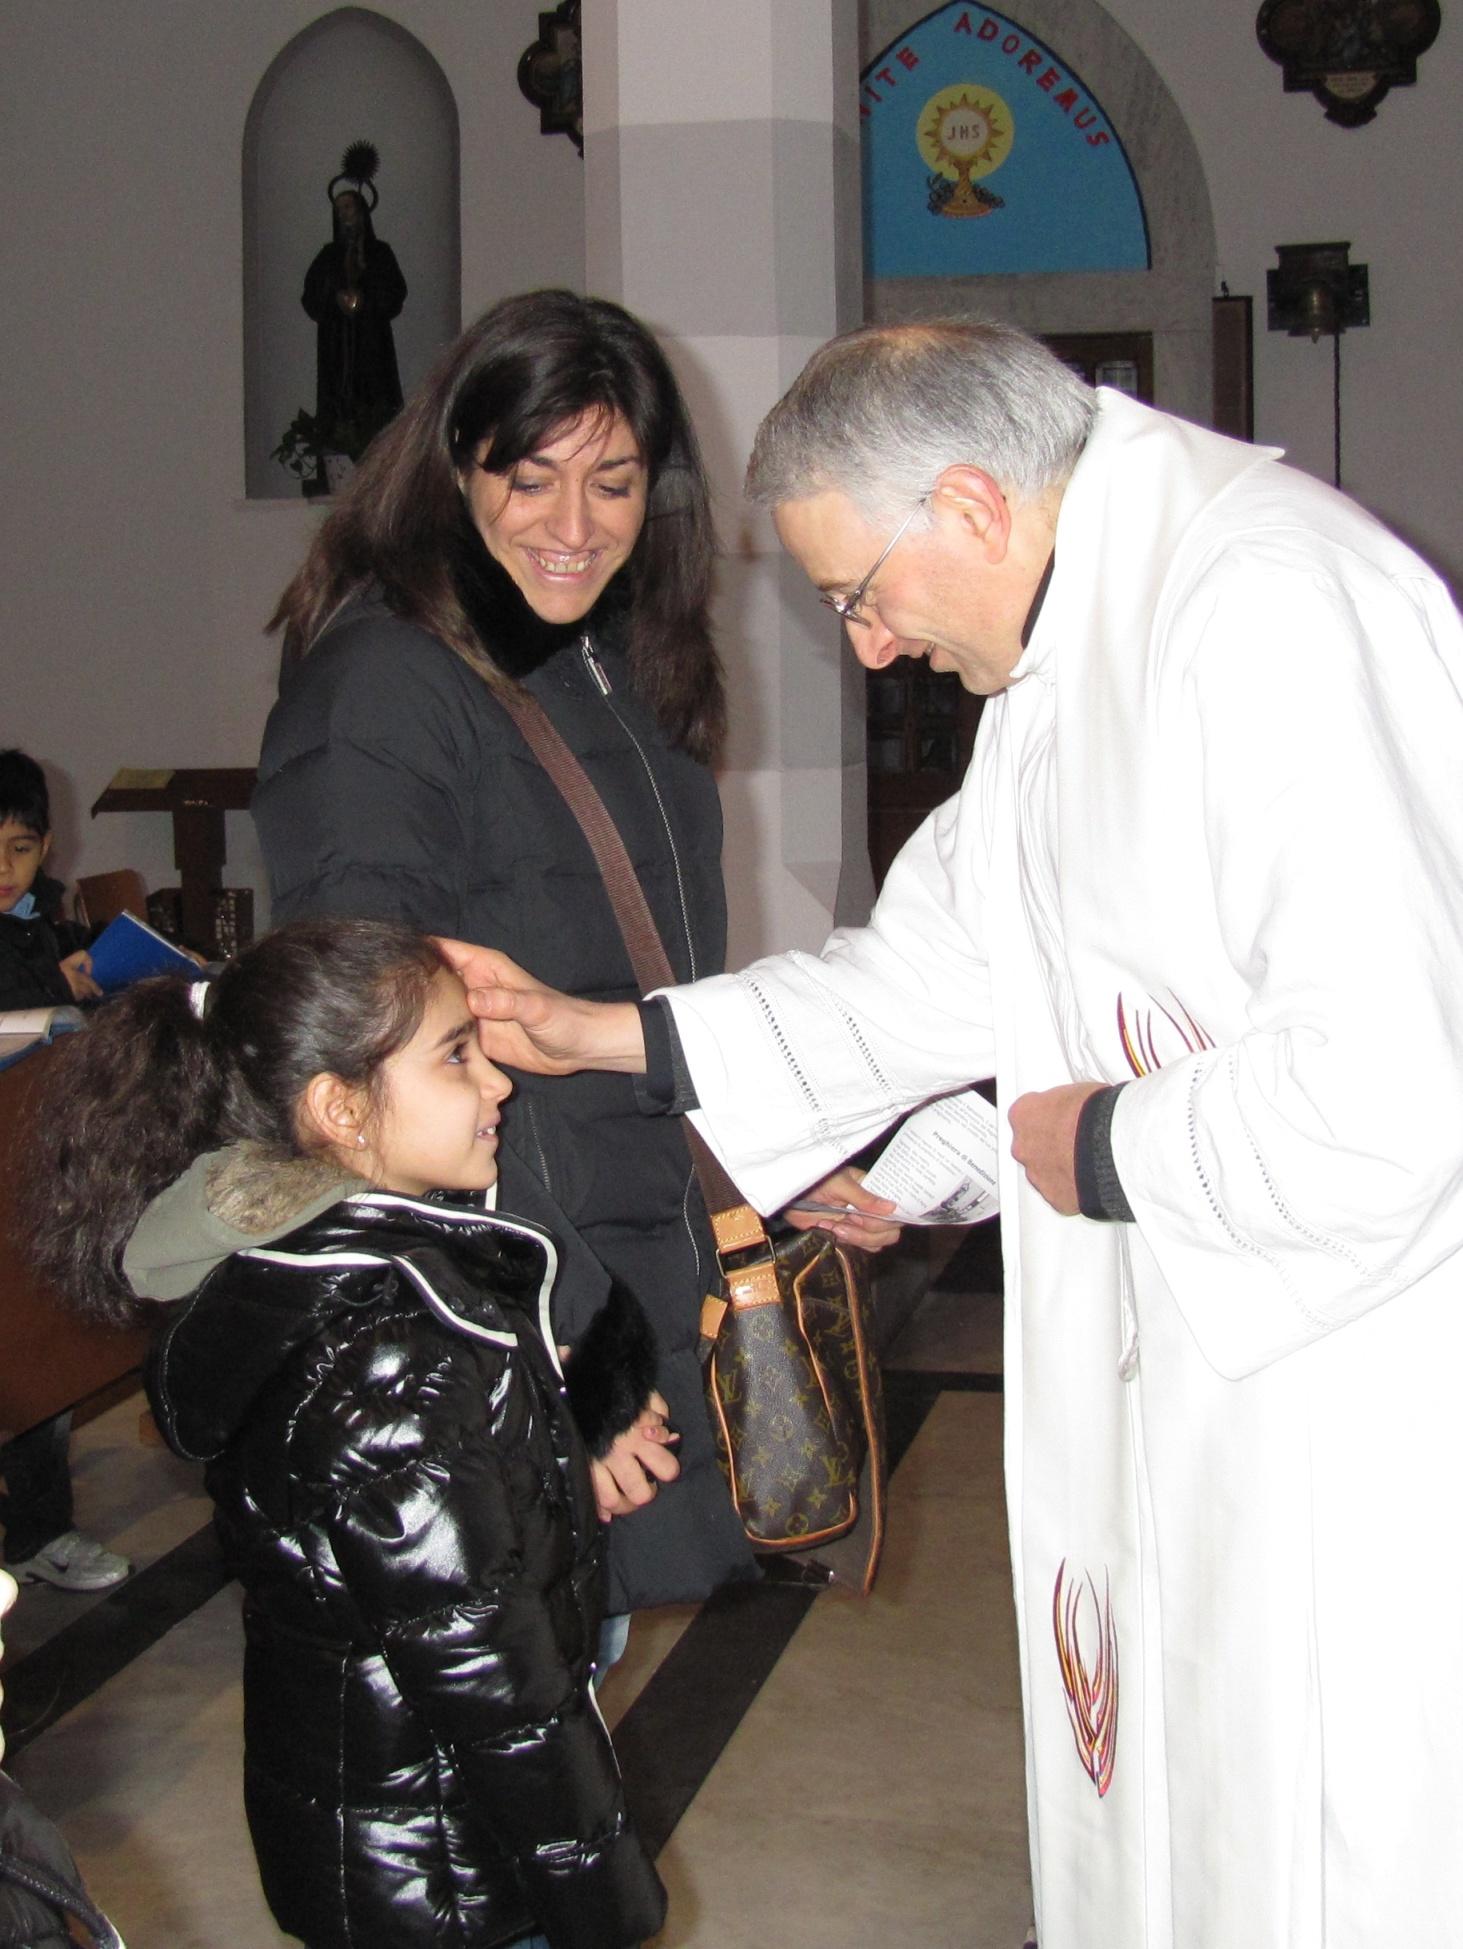 ricordo_battesimo_gesu_2011-01-23-16-29-09